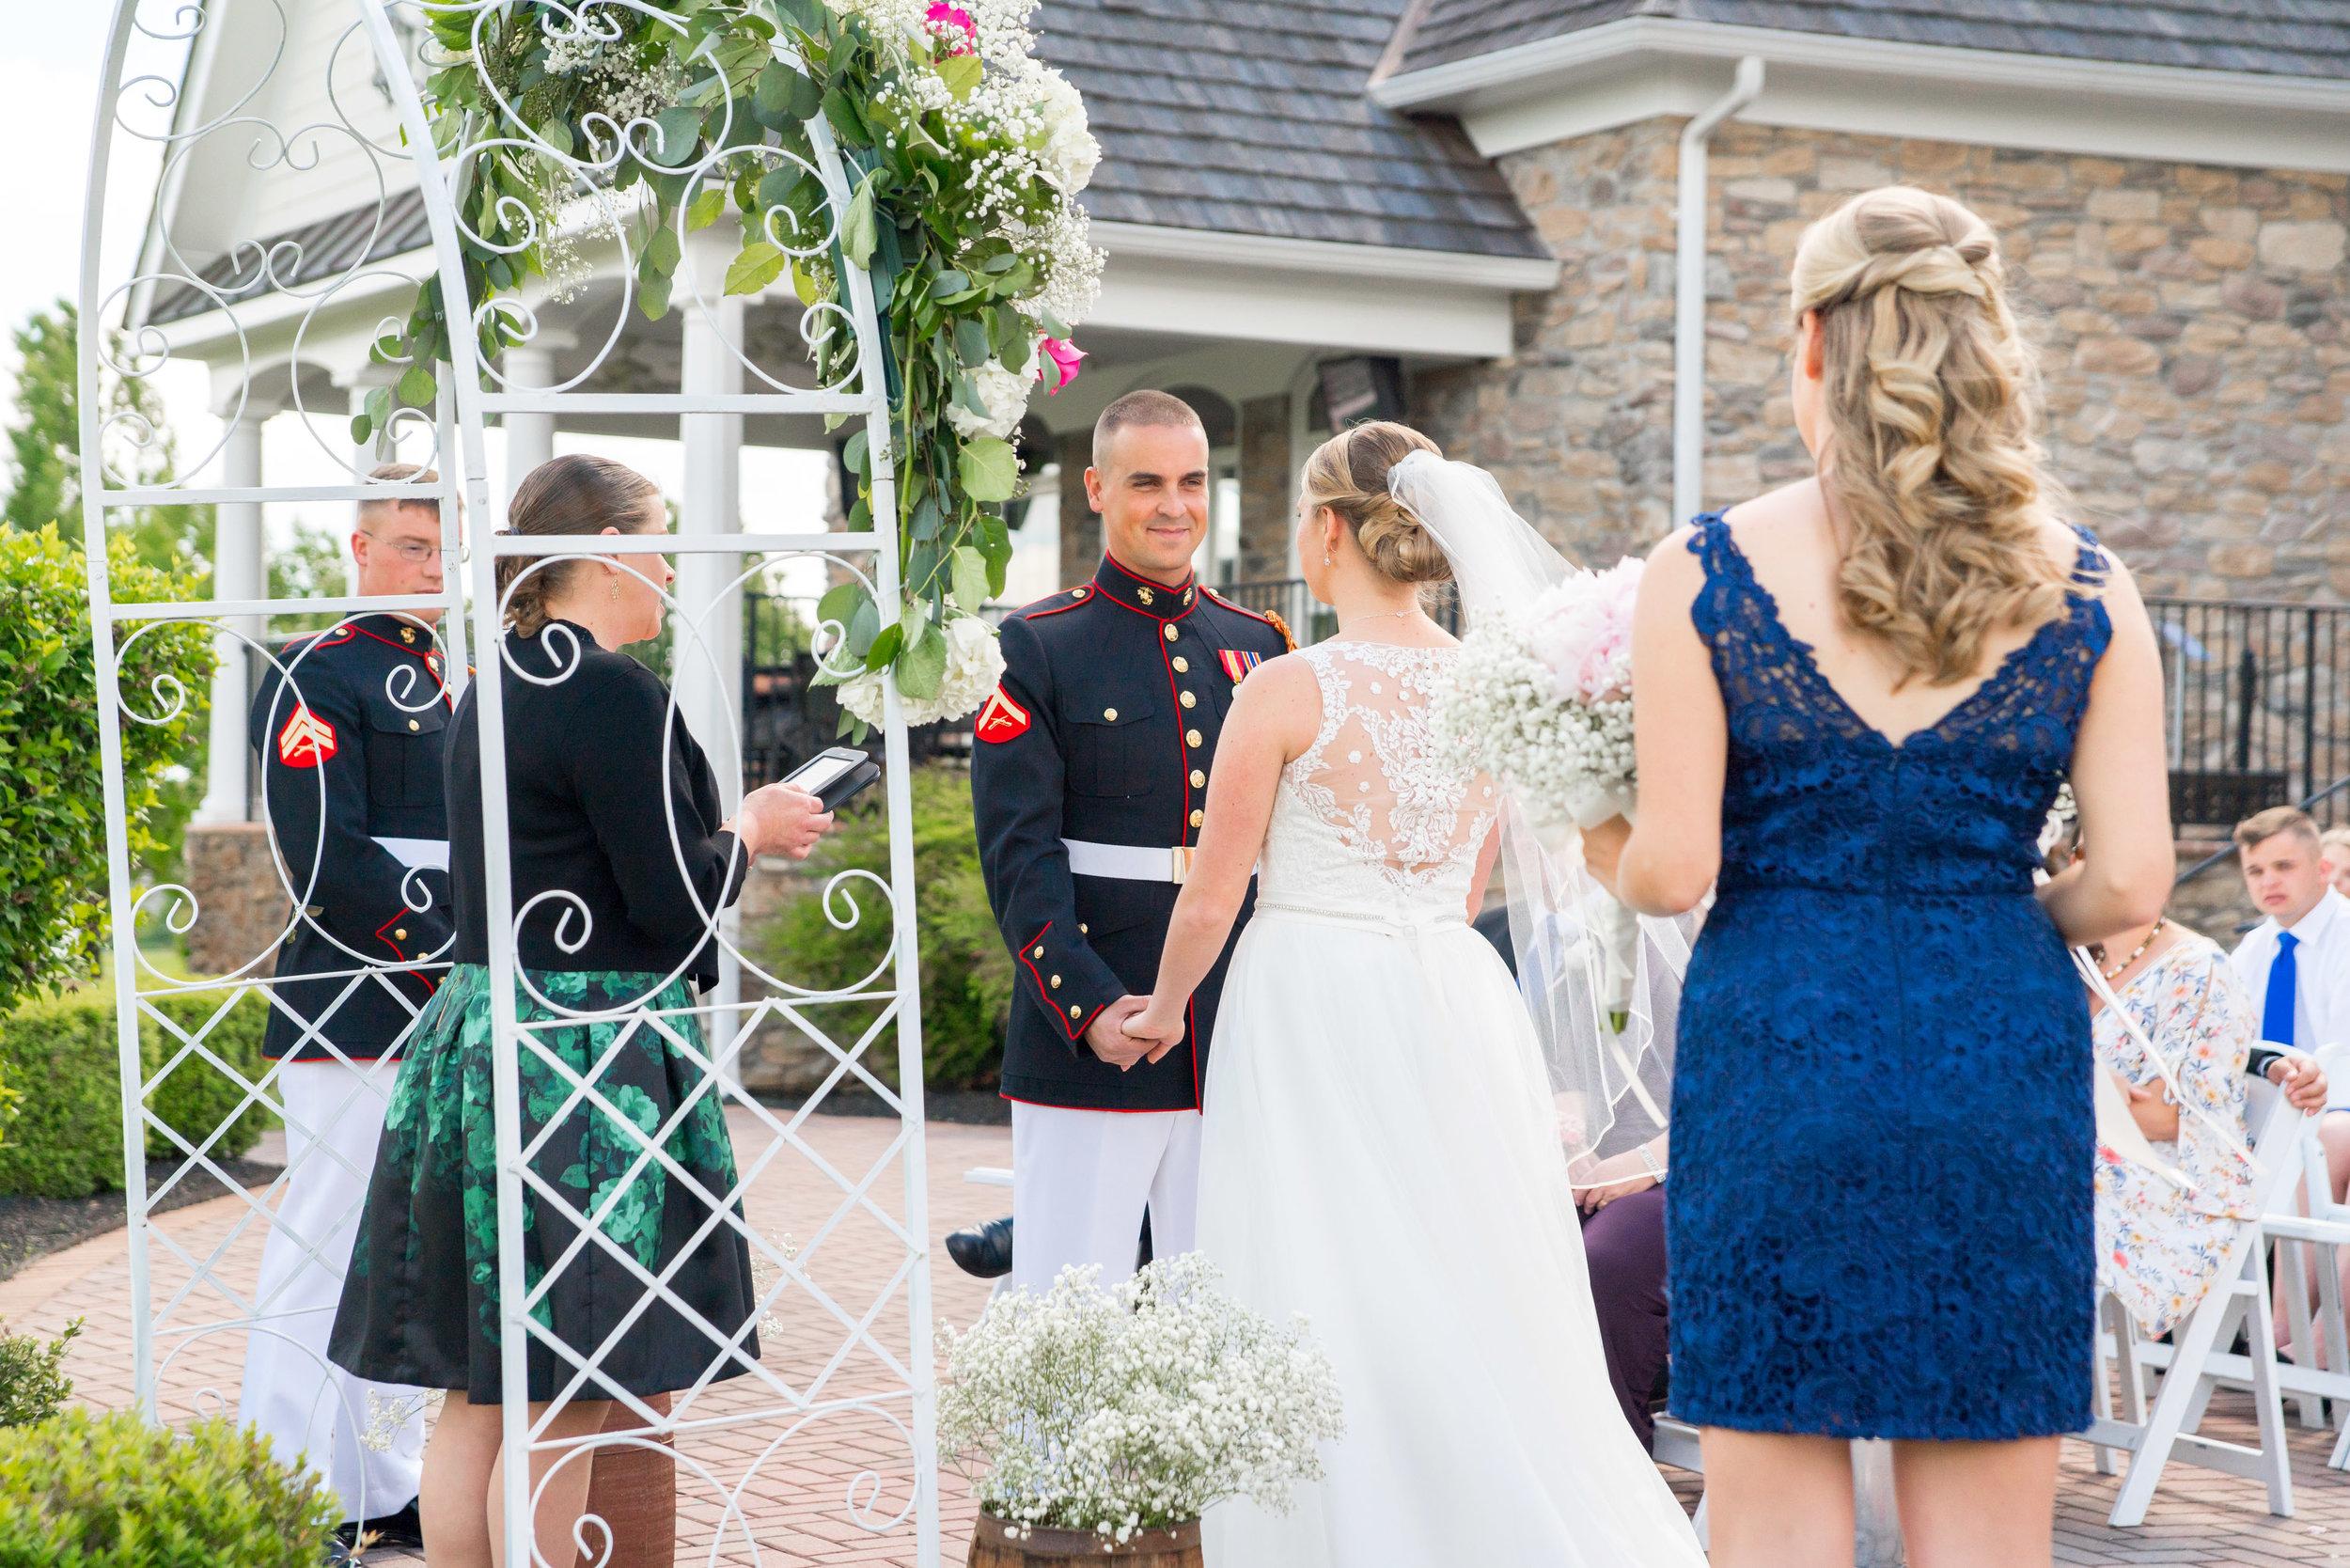 Bride and groom wedding photos at piedmont golf club